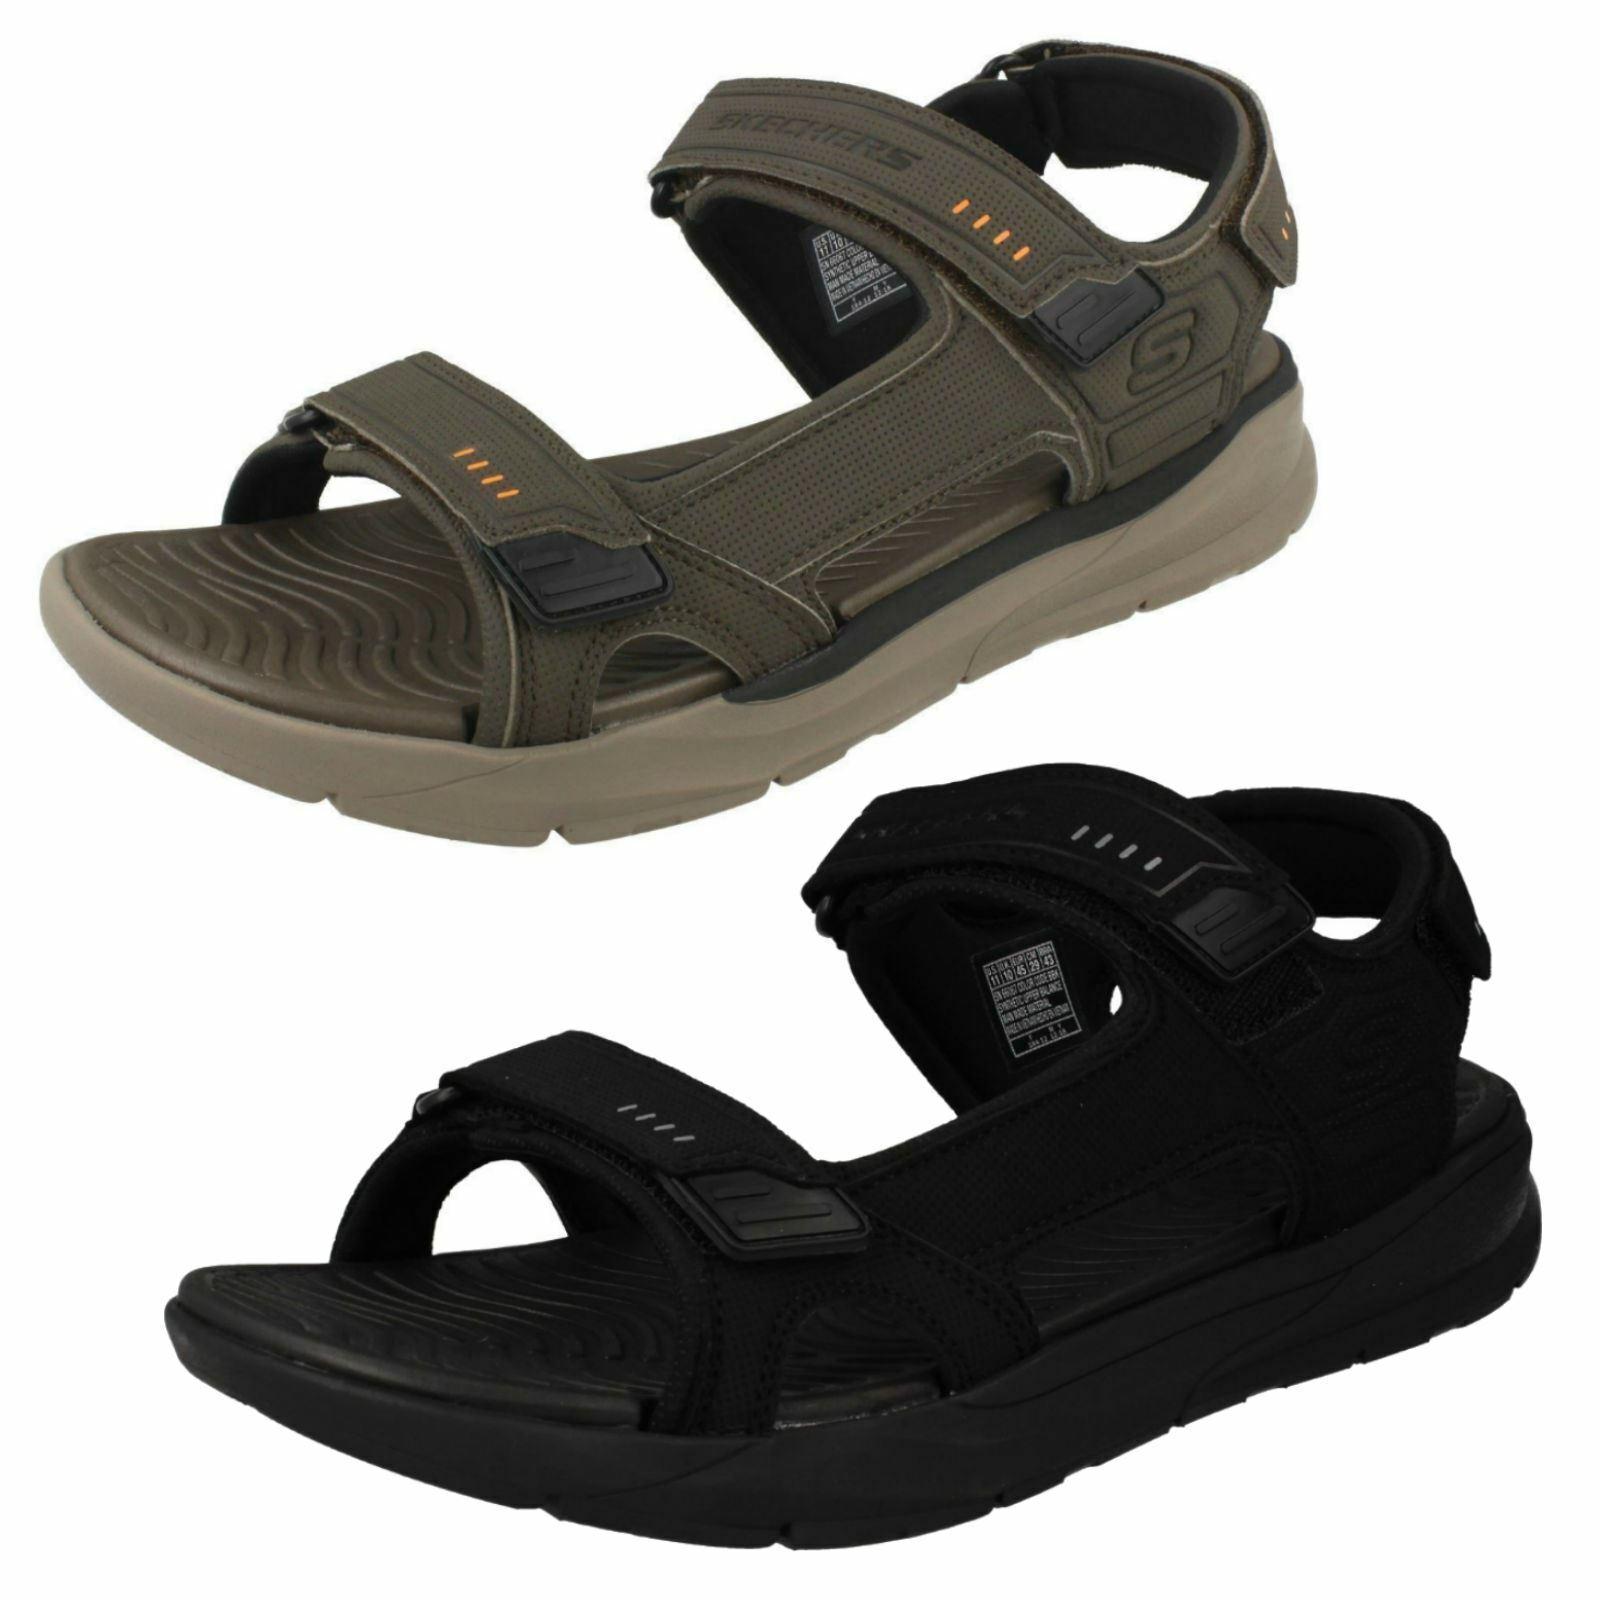 Mens Skechers Relaxed Fit Memory Foam Sandals Senco